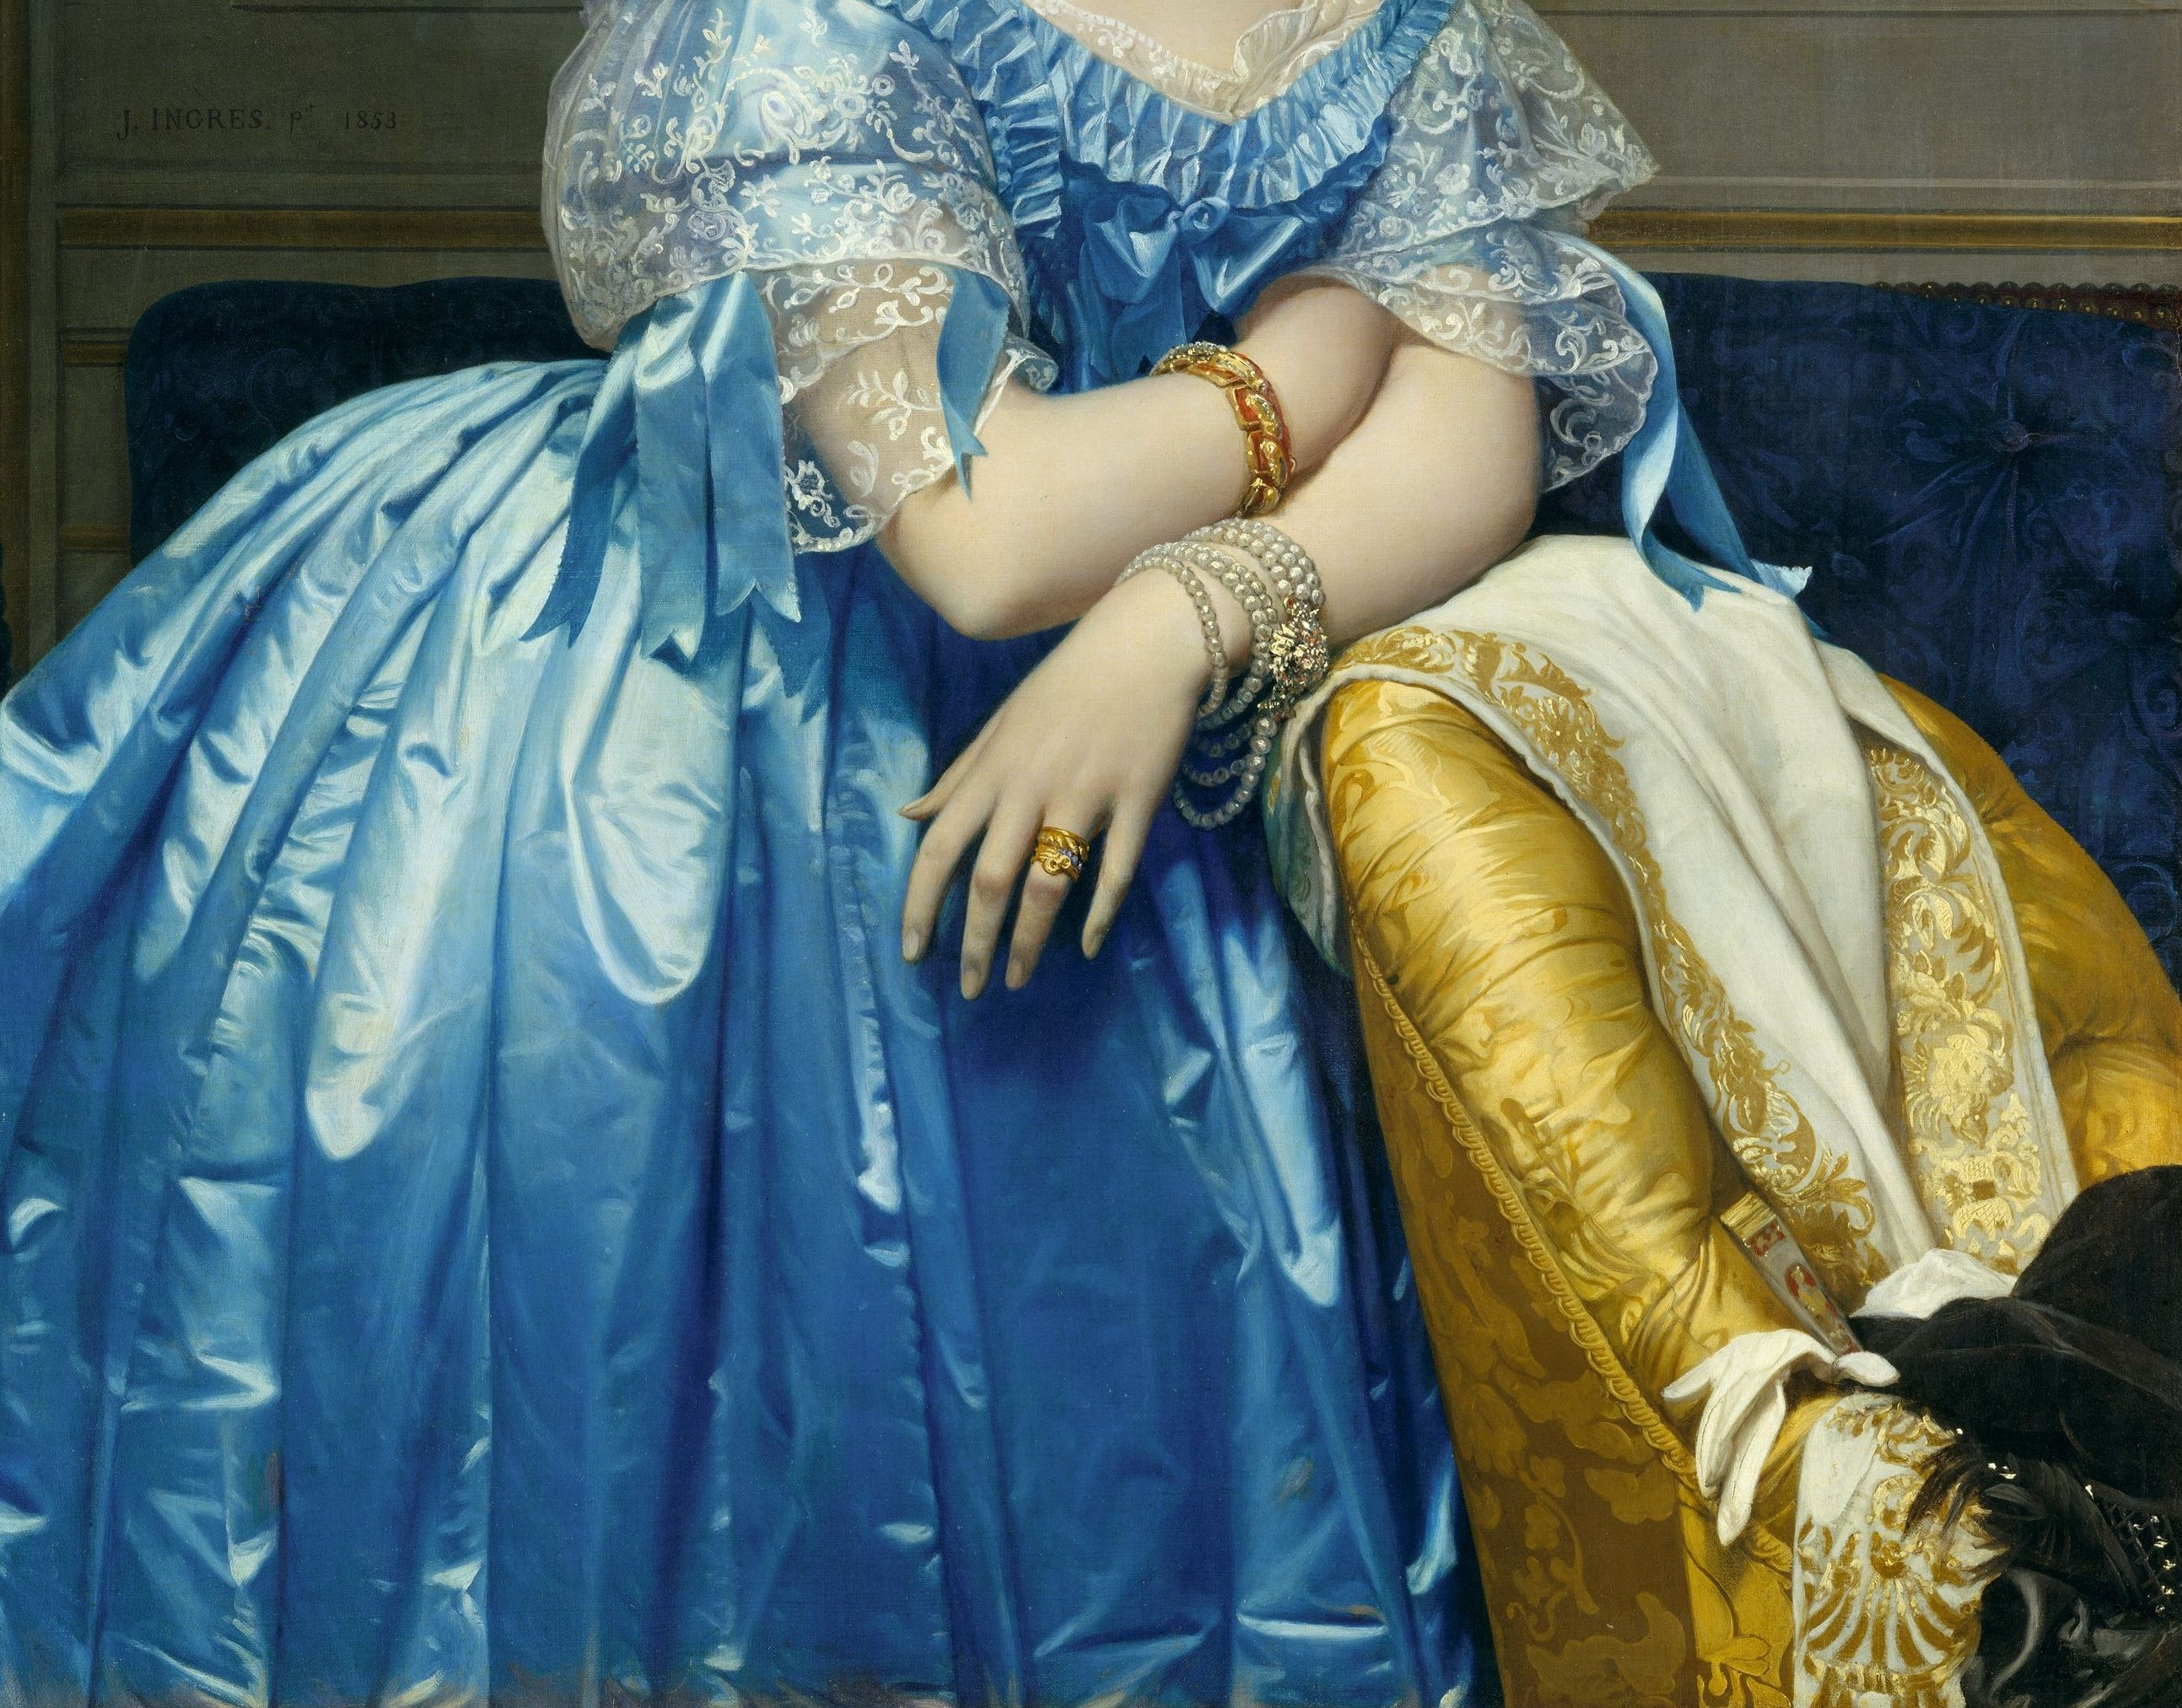 Jean Auguste Dominique Ingres Princesse de Broglie (detail)